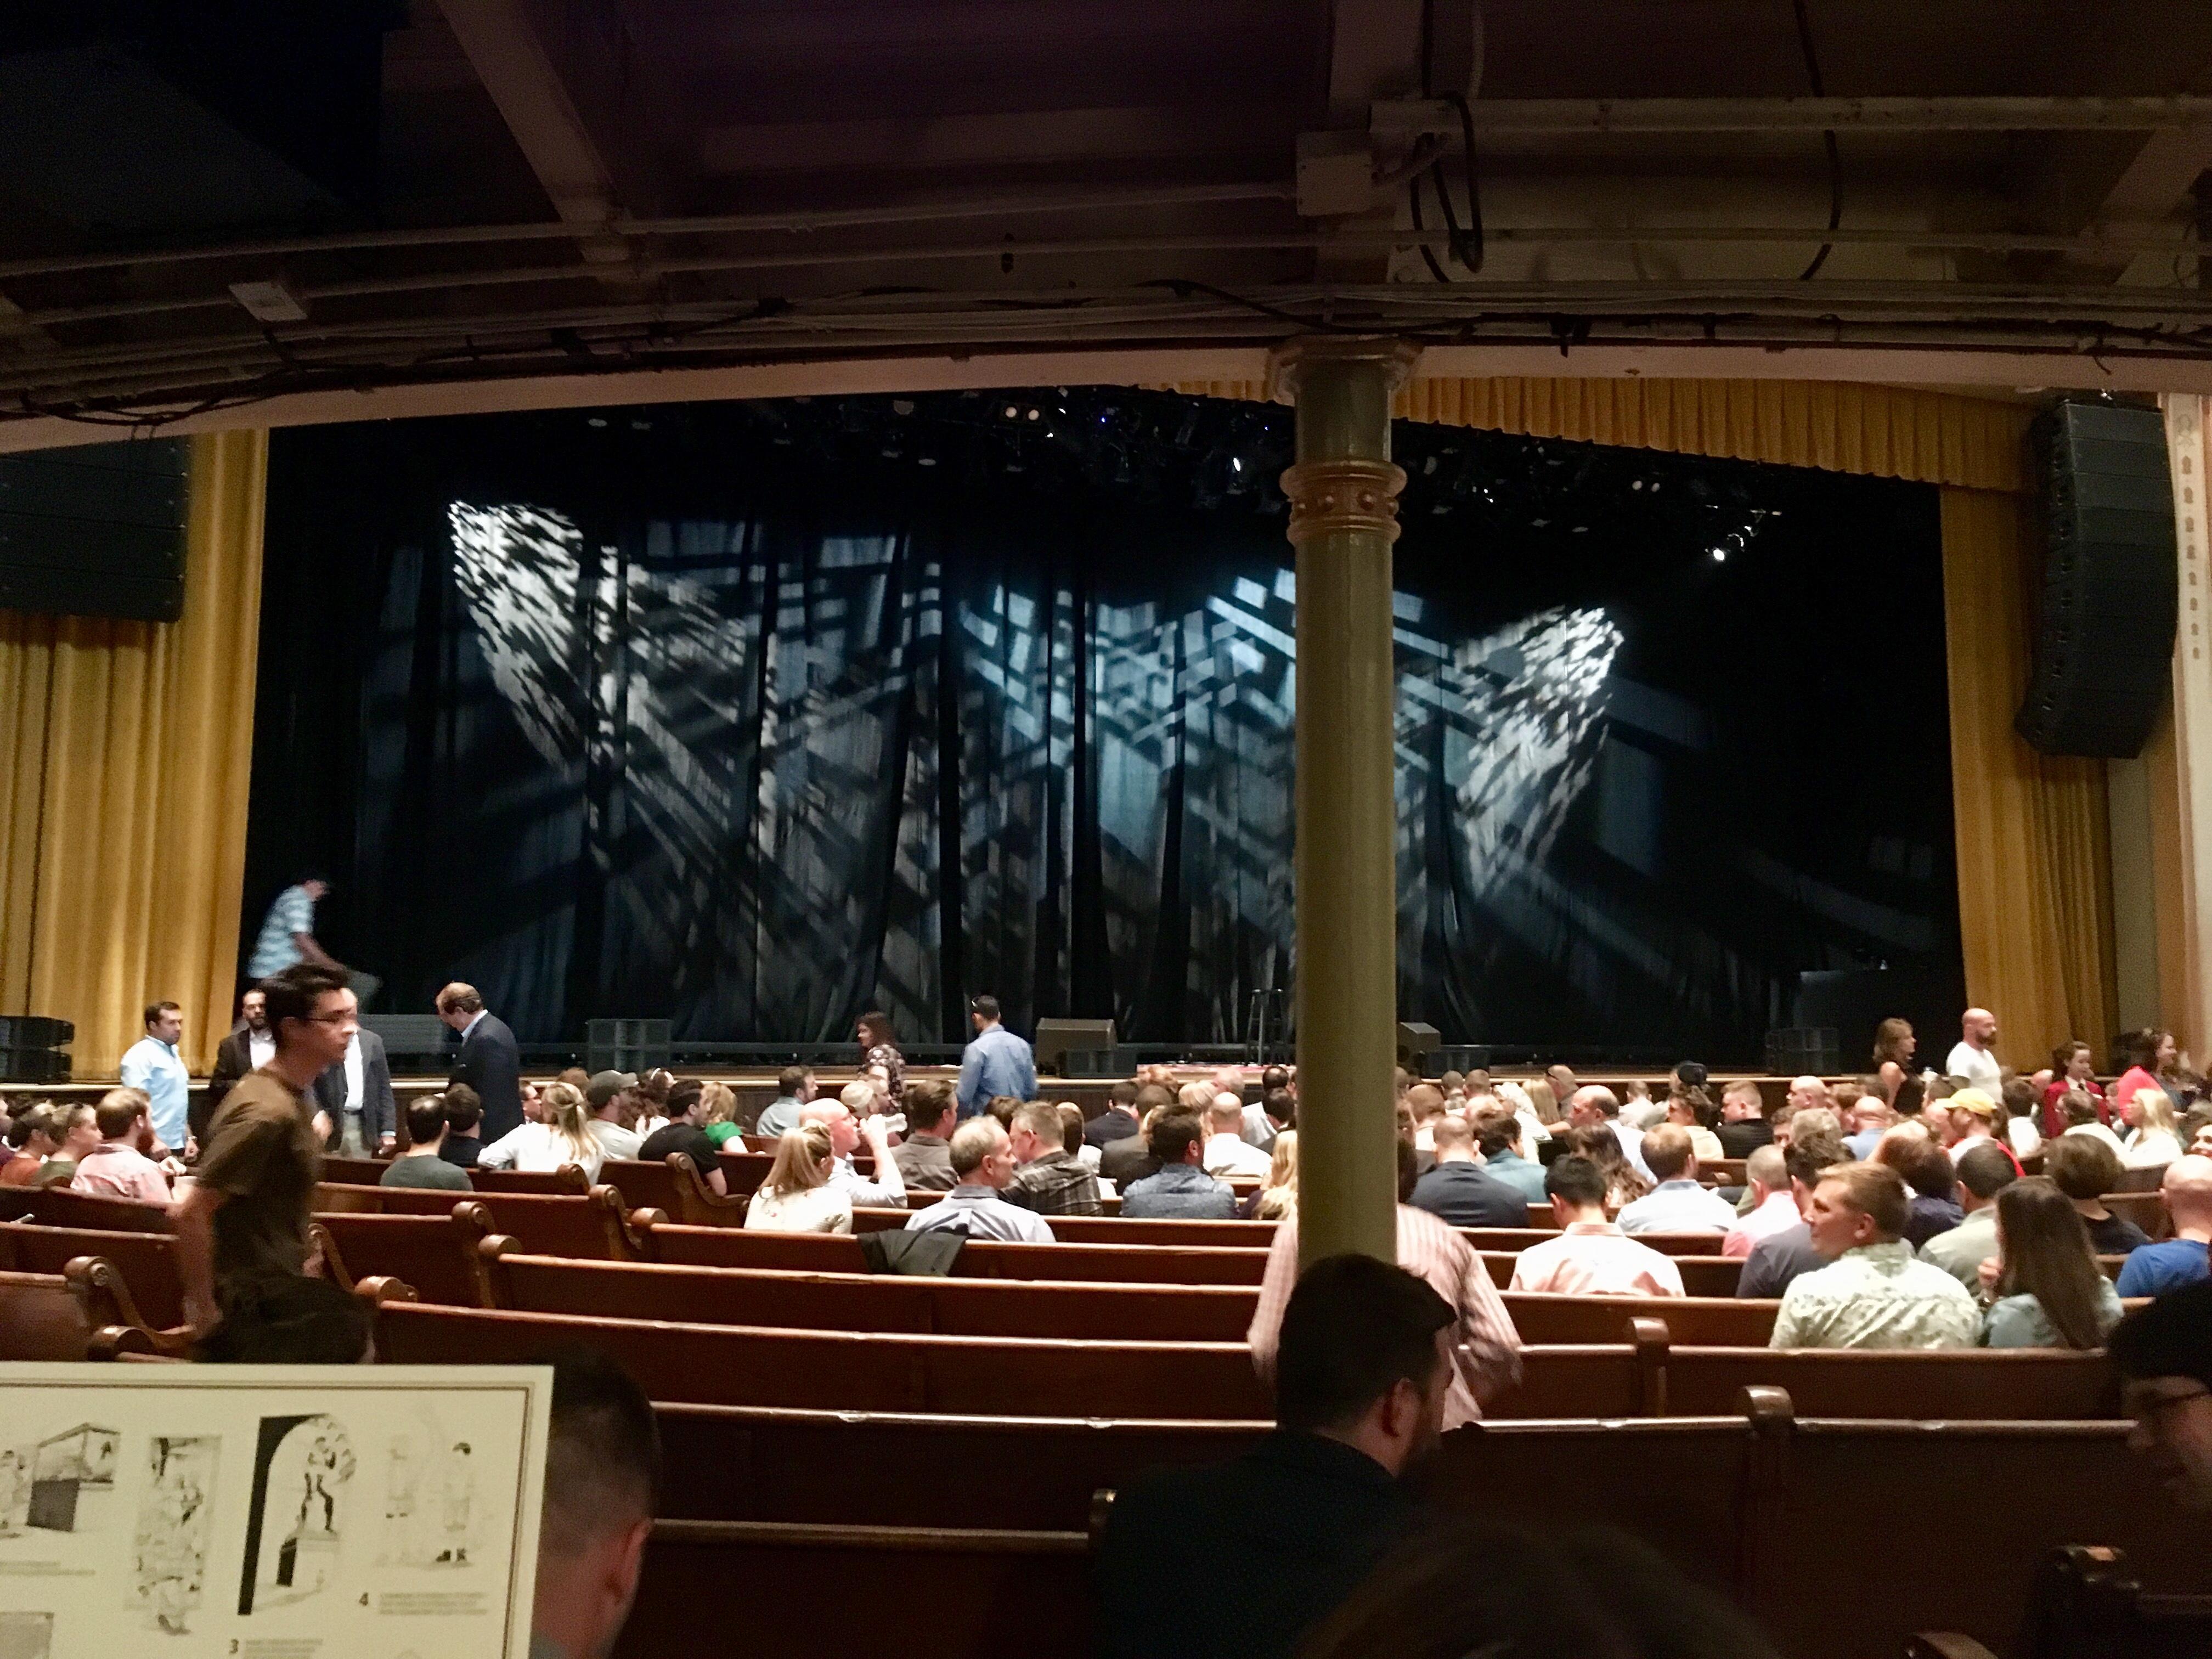 Ryman Auditorium Section MF-6 Row Q Seat 1